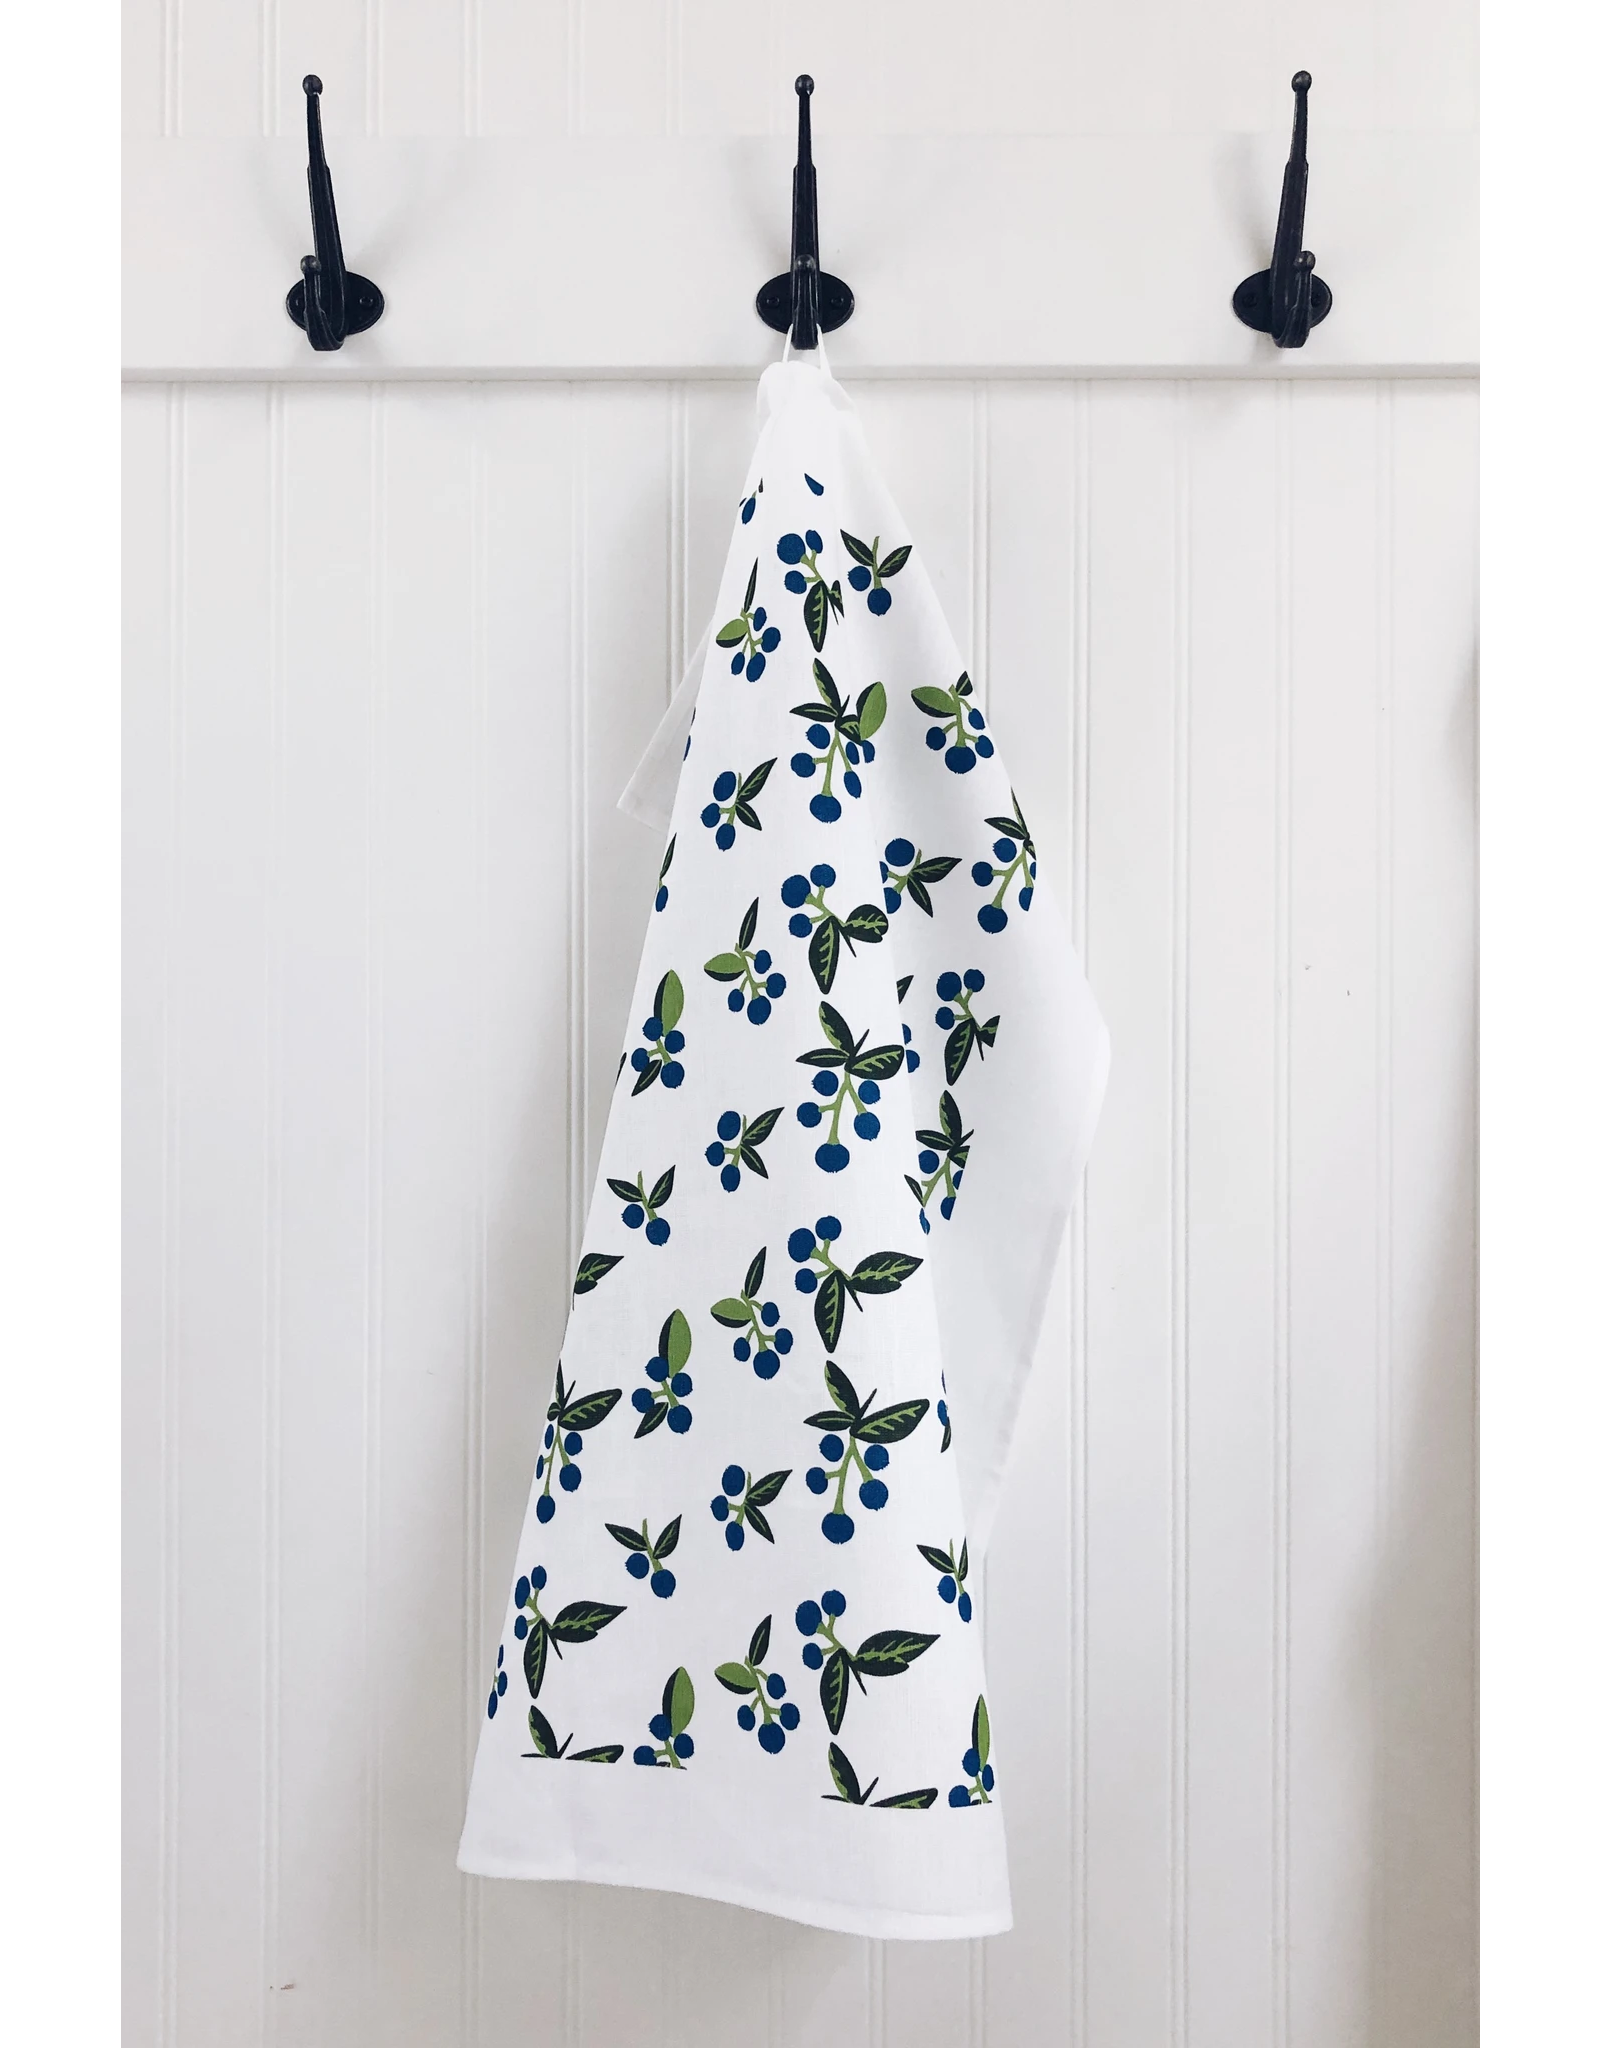 Ten & Co Tea Towel - Vintage Blueberry